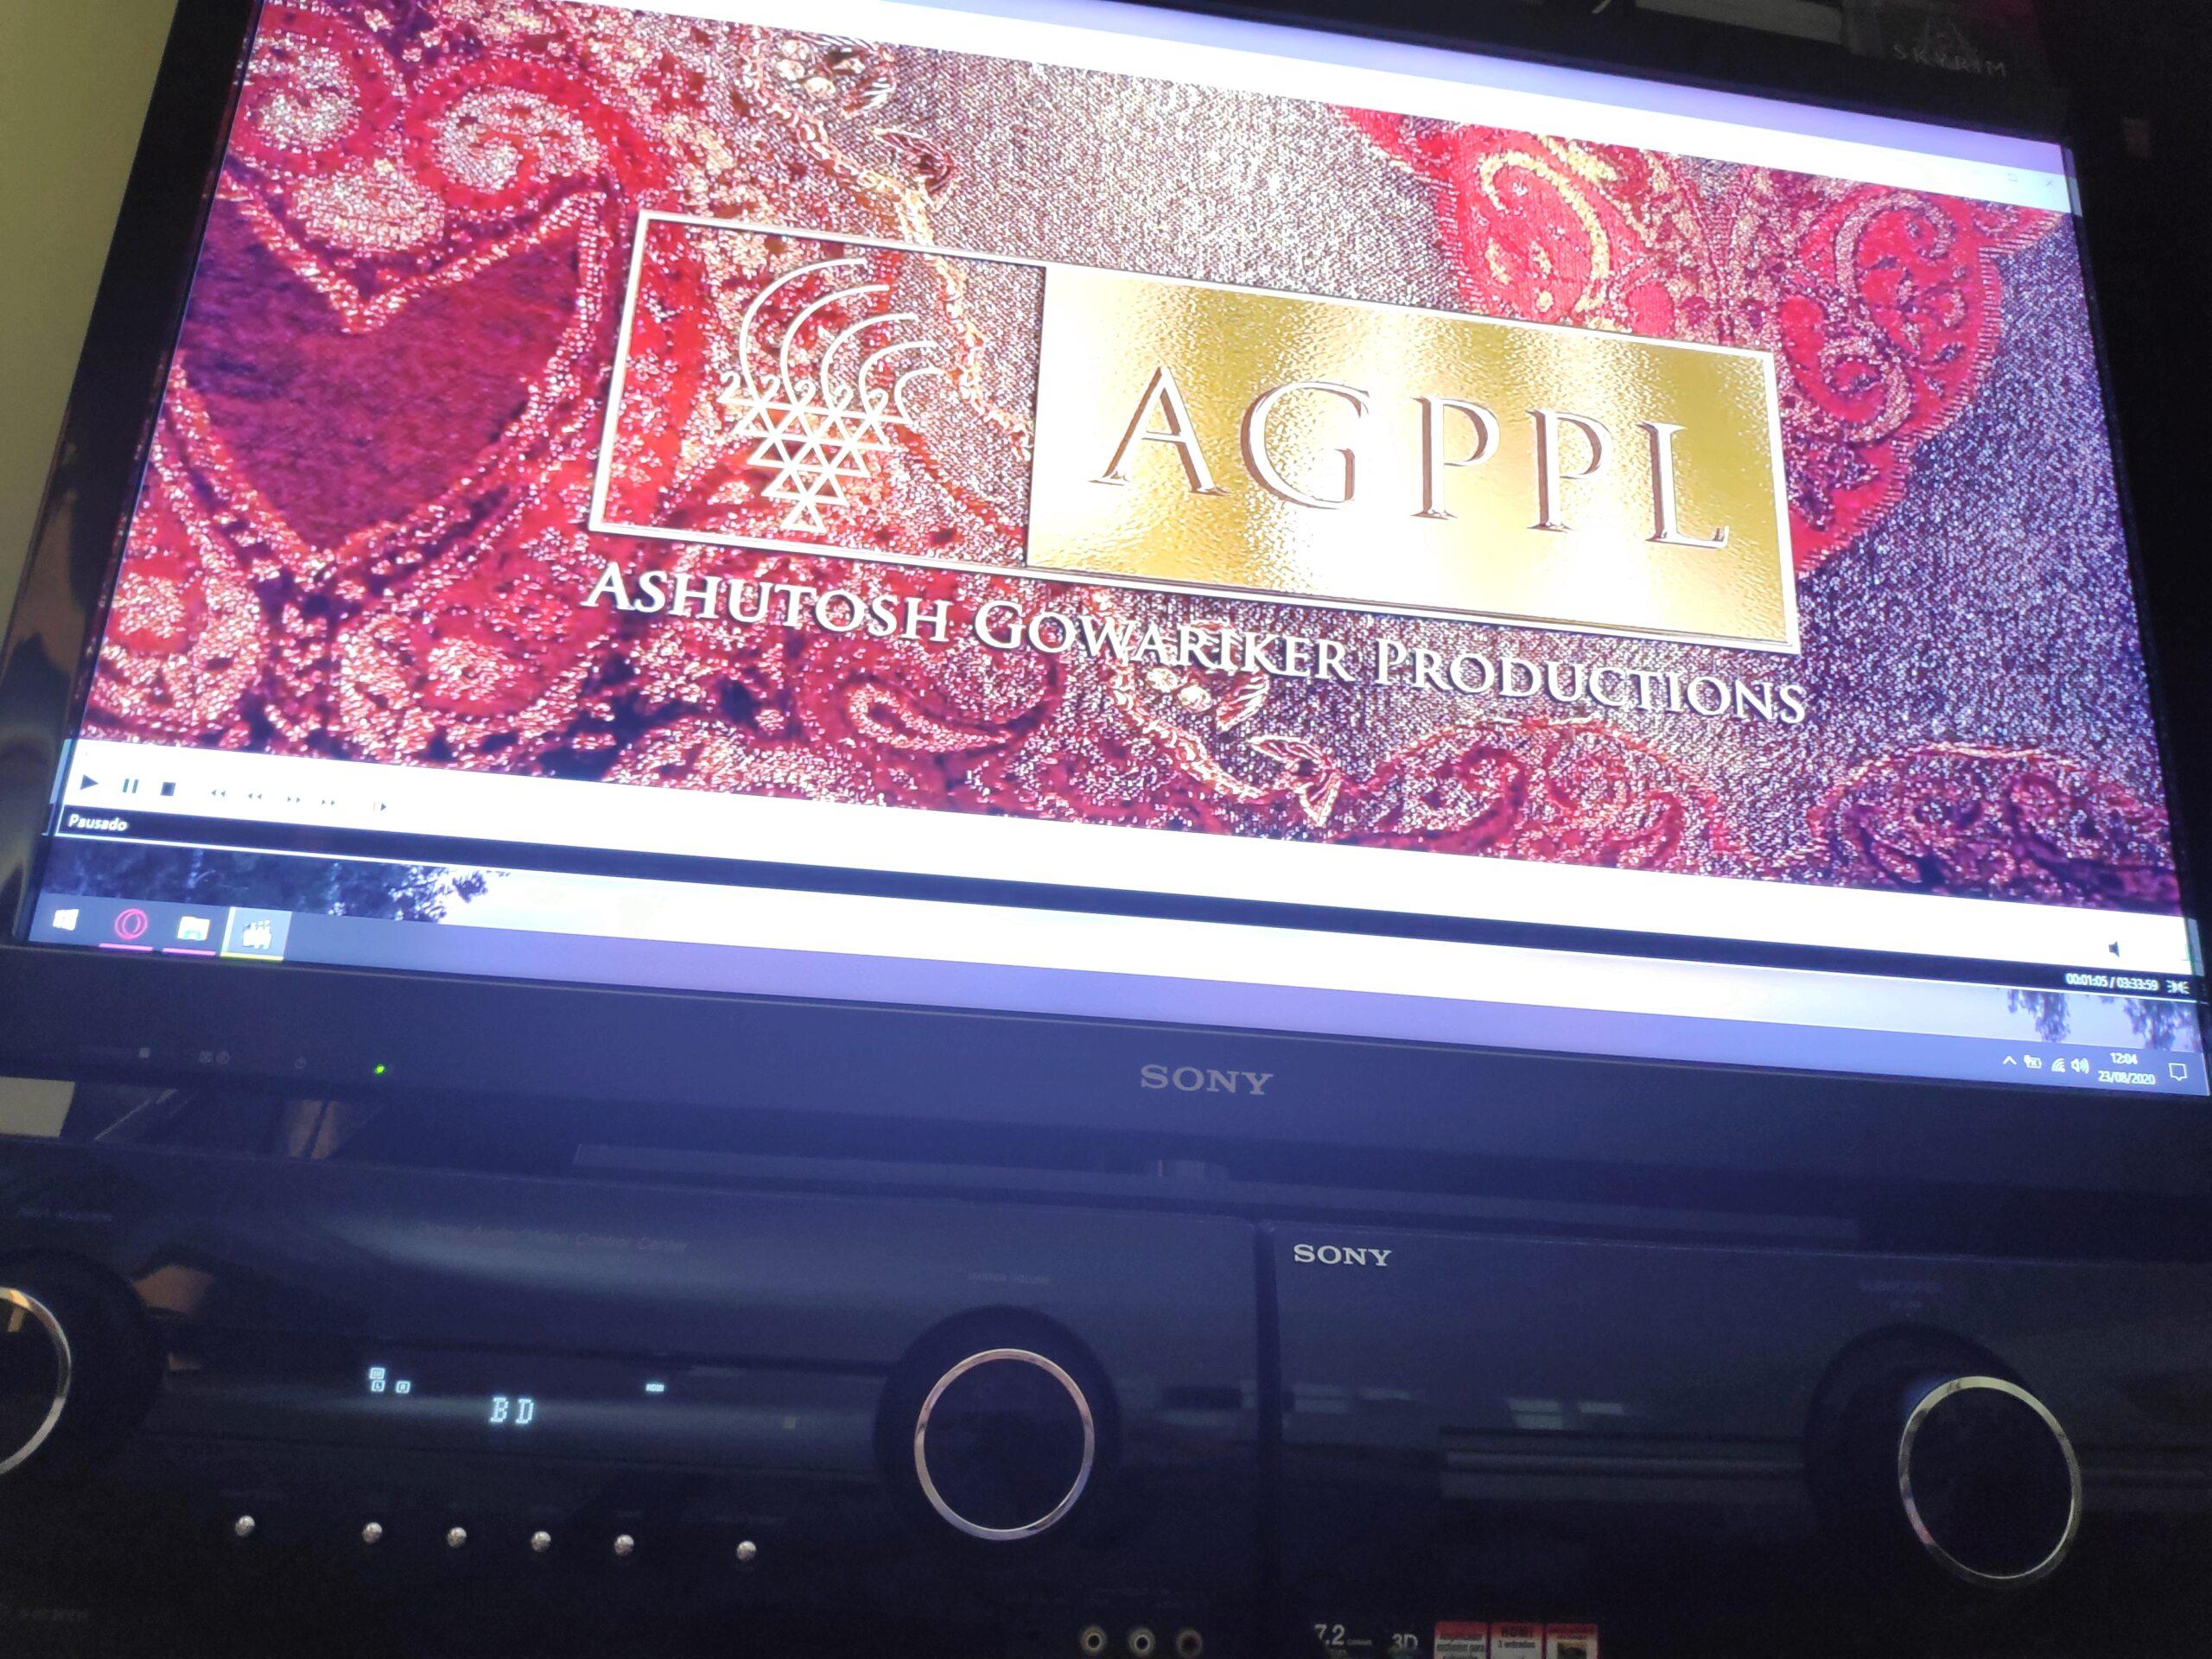 Audio madness Dts-hd11